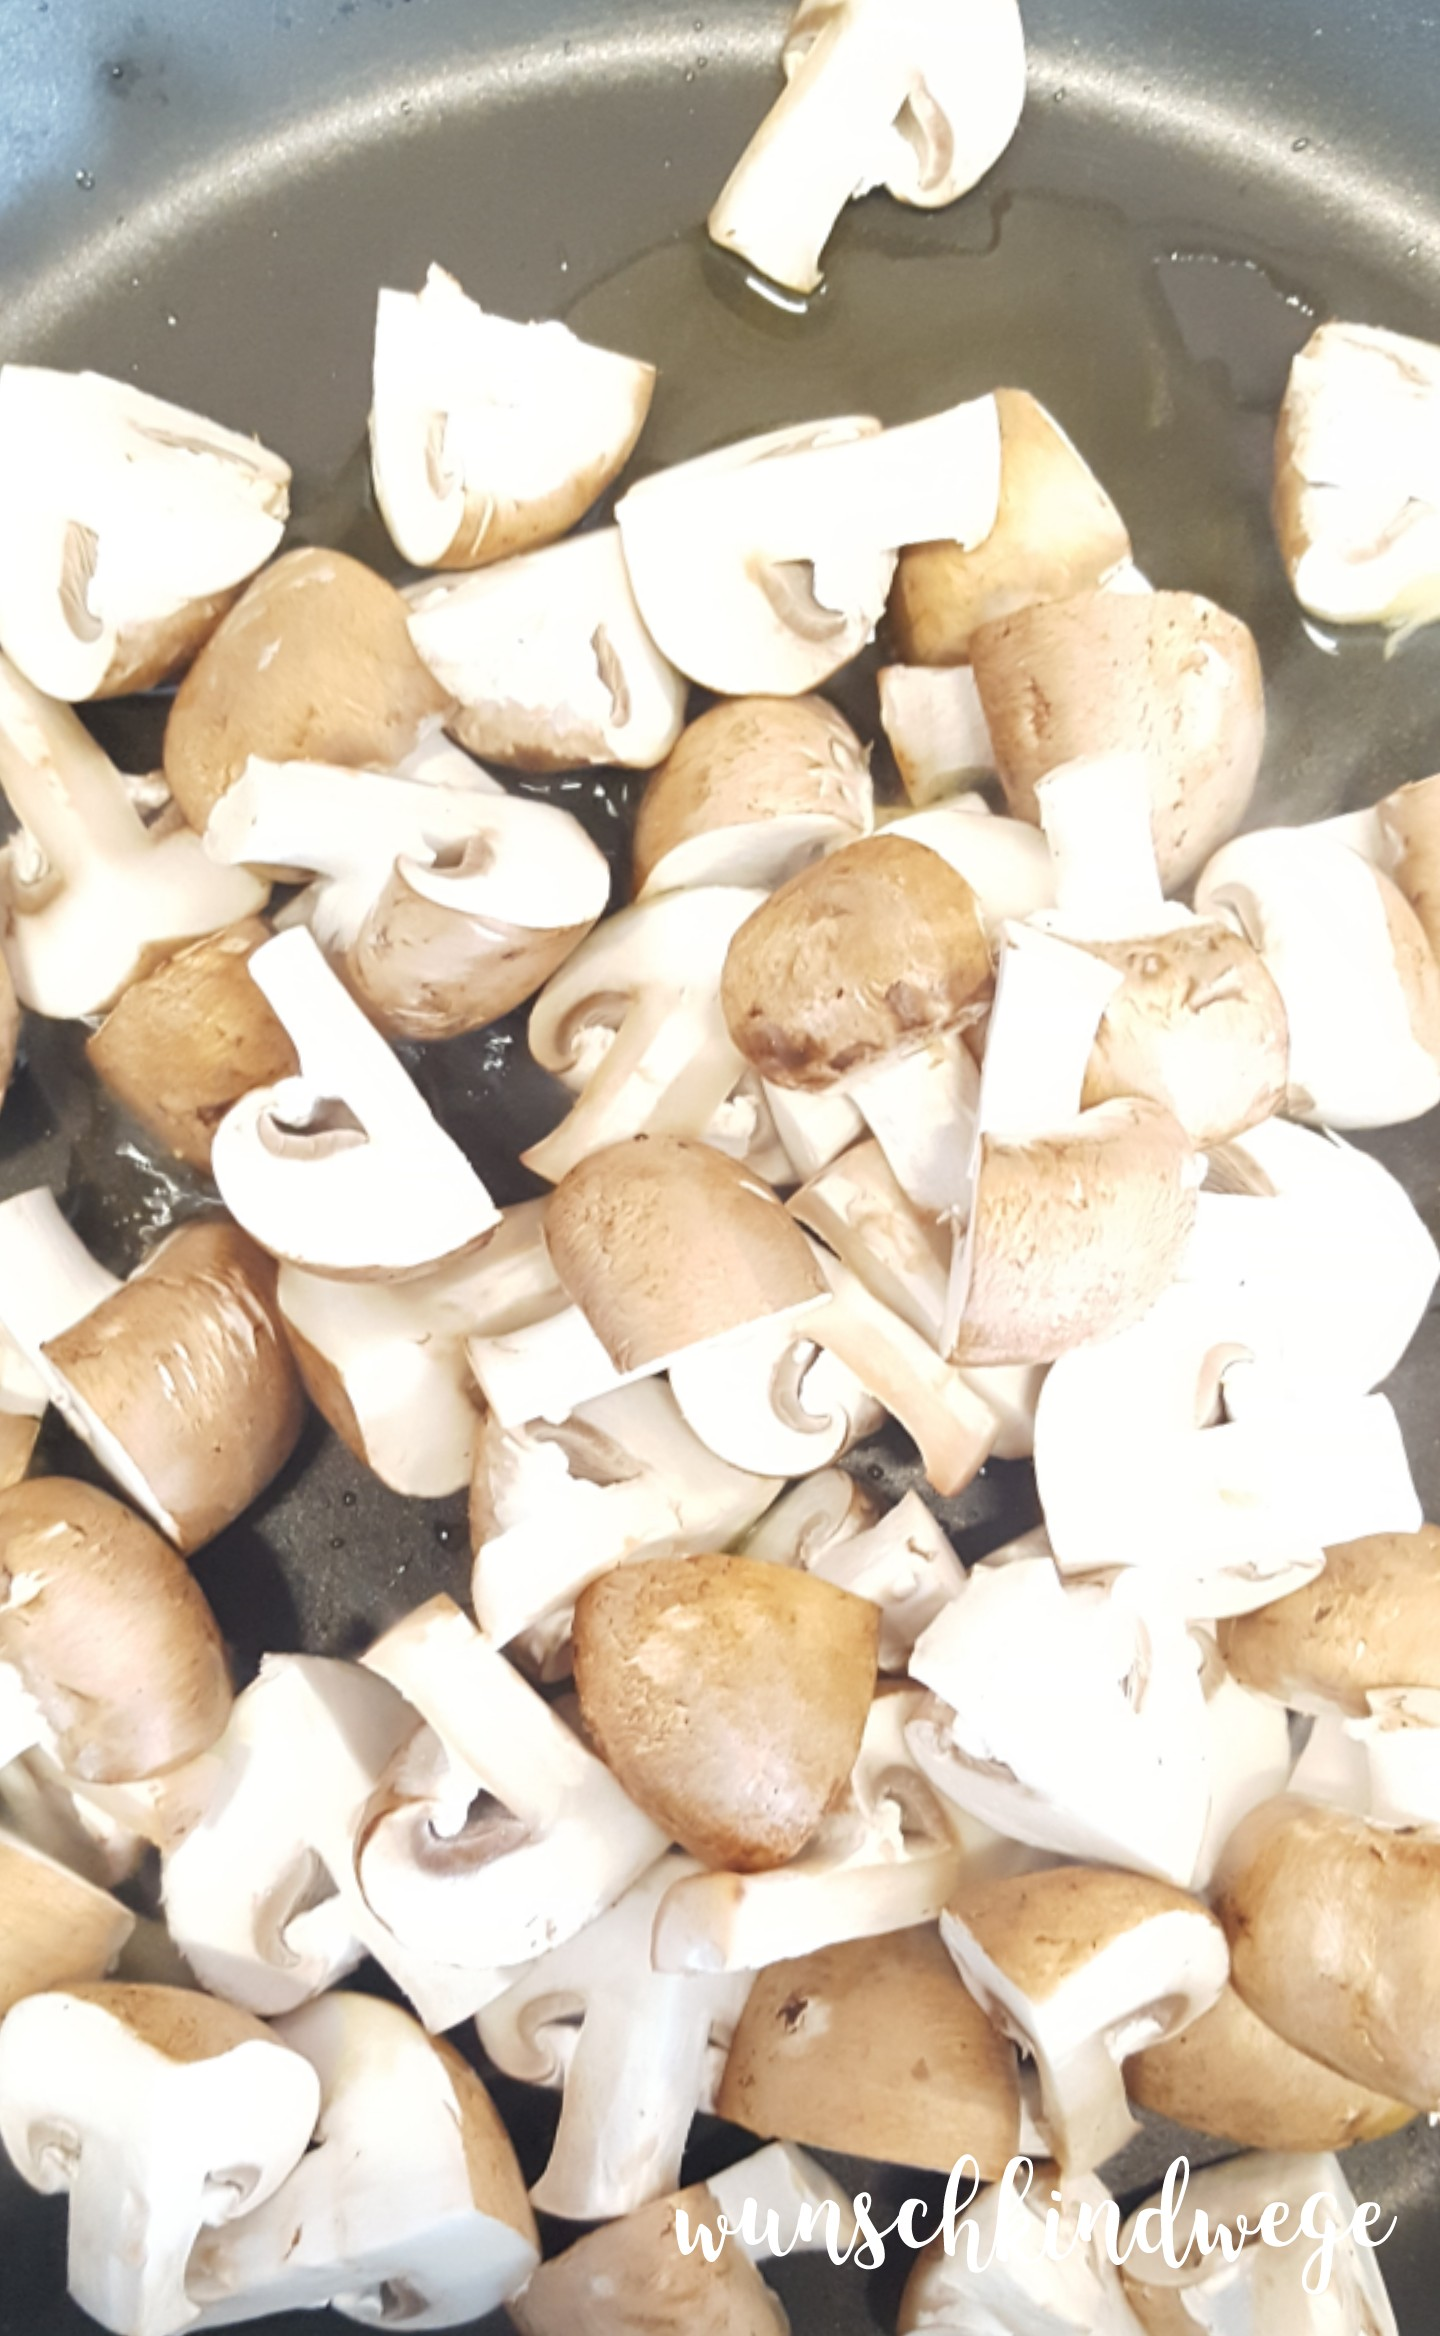 Silvesterwochenende Champignons